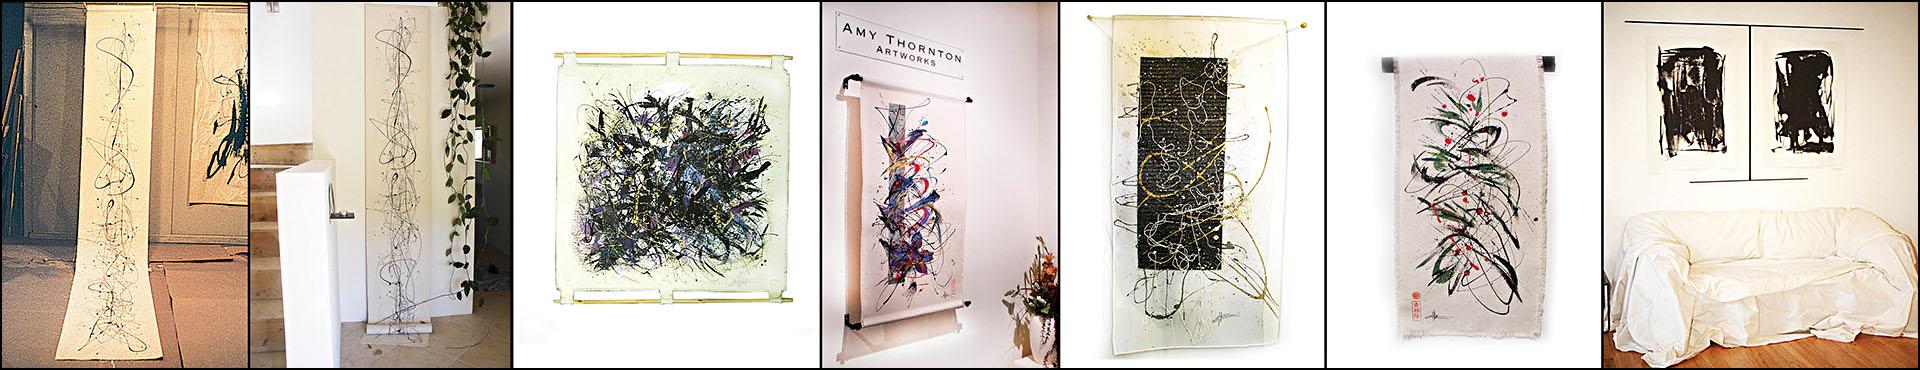 Amy Thornton Art History Denver Nineties